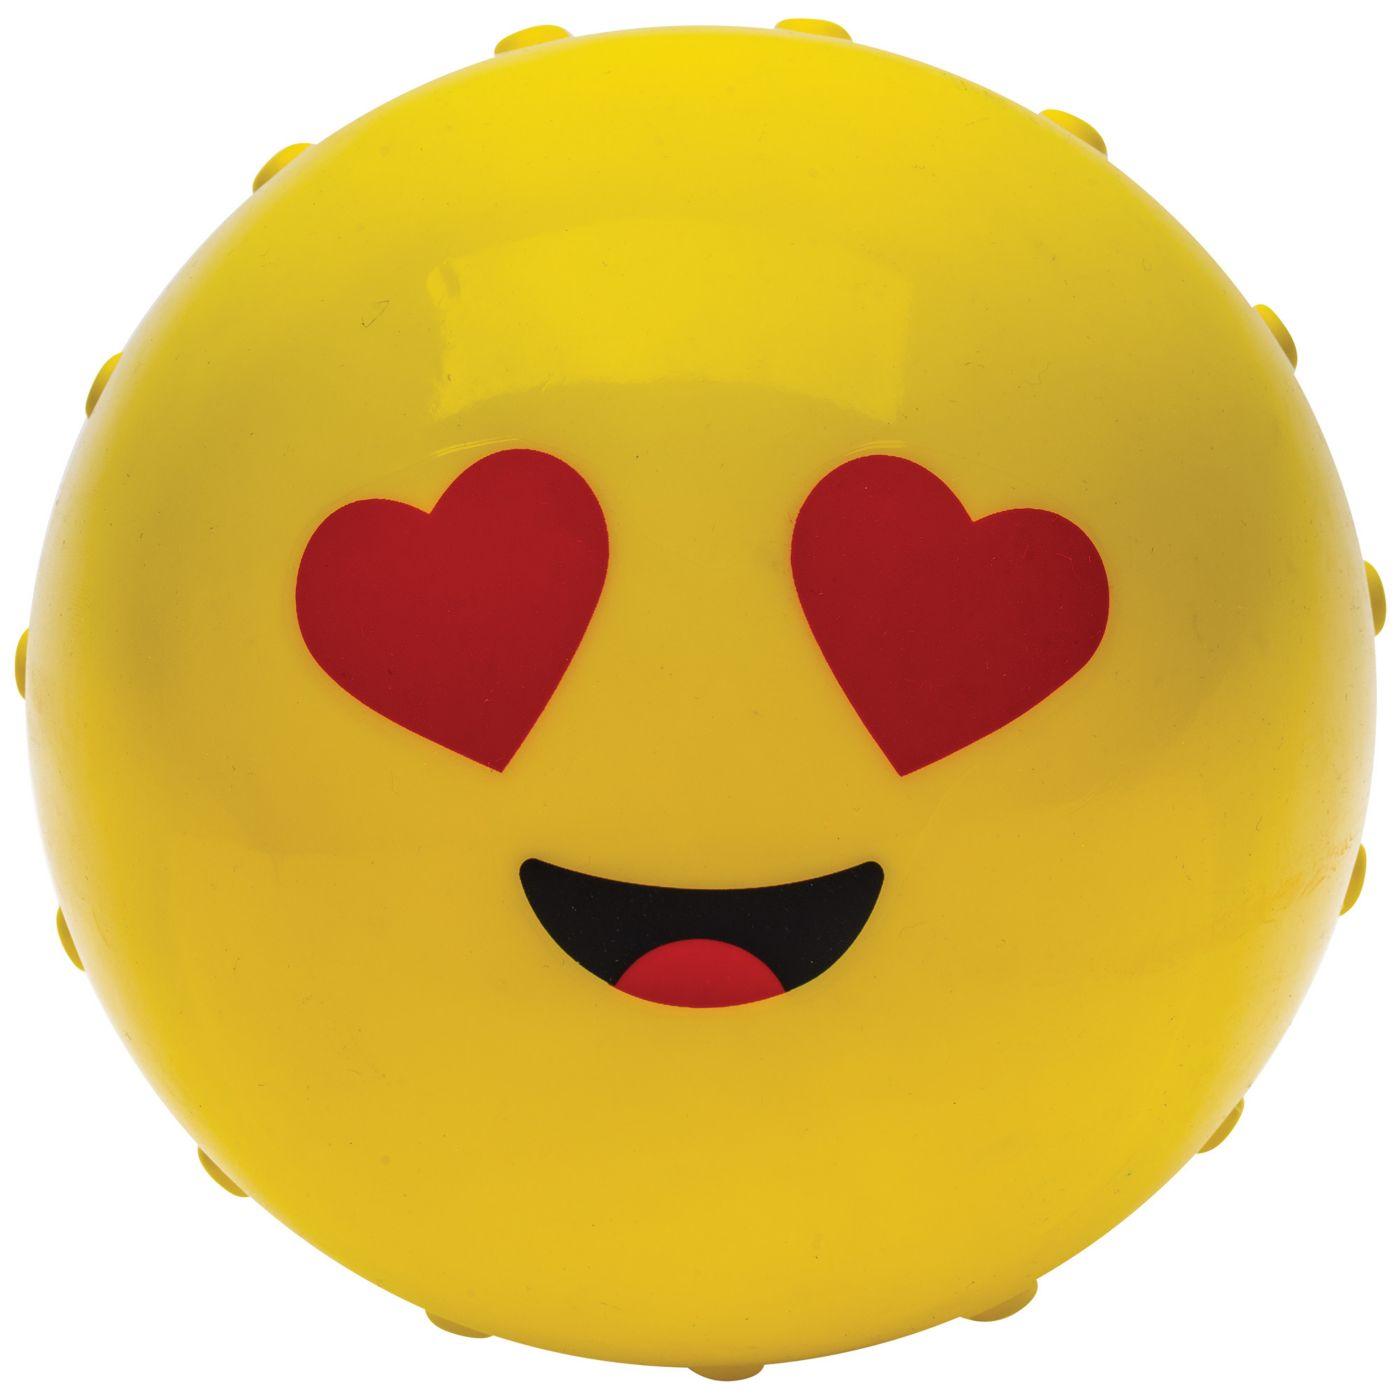 "Franklin 5"" Emoji Smiley Face Ball"